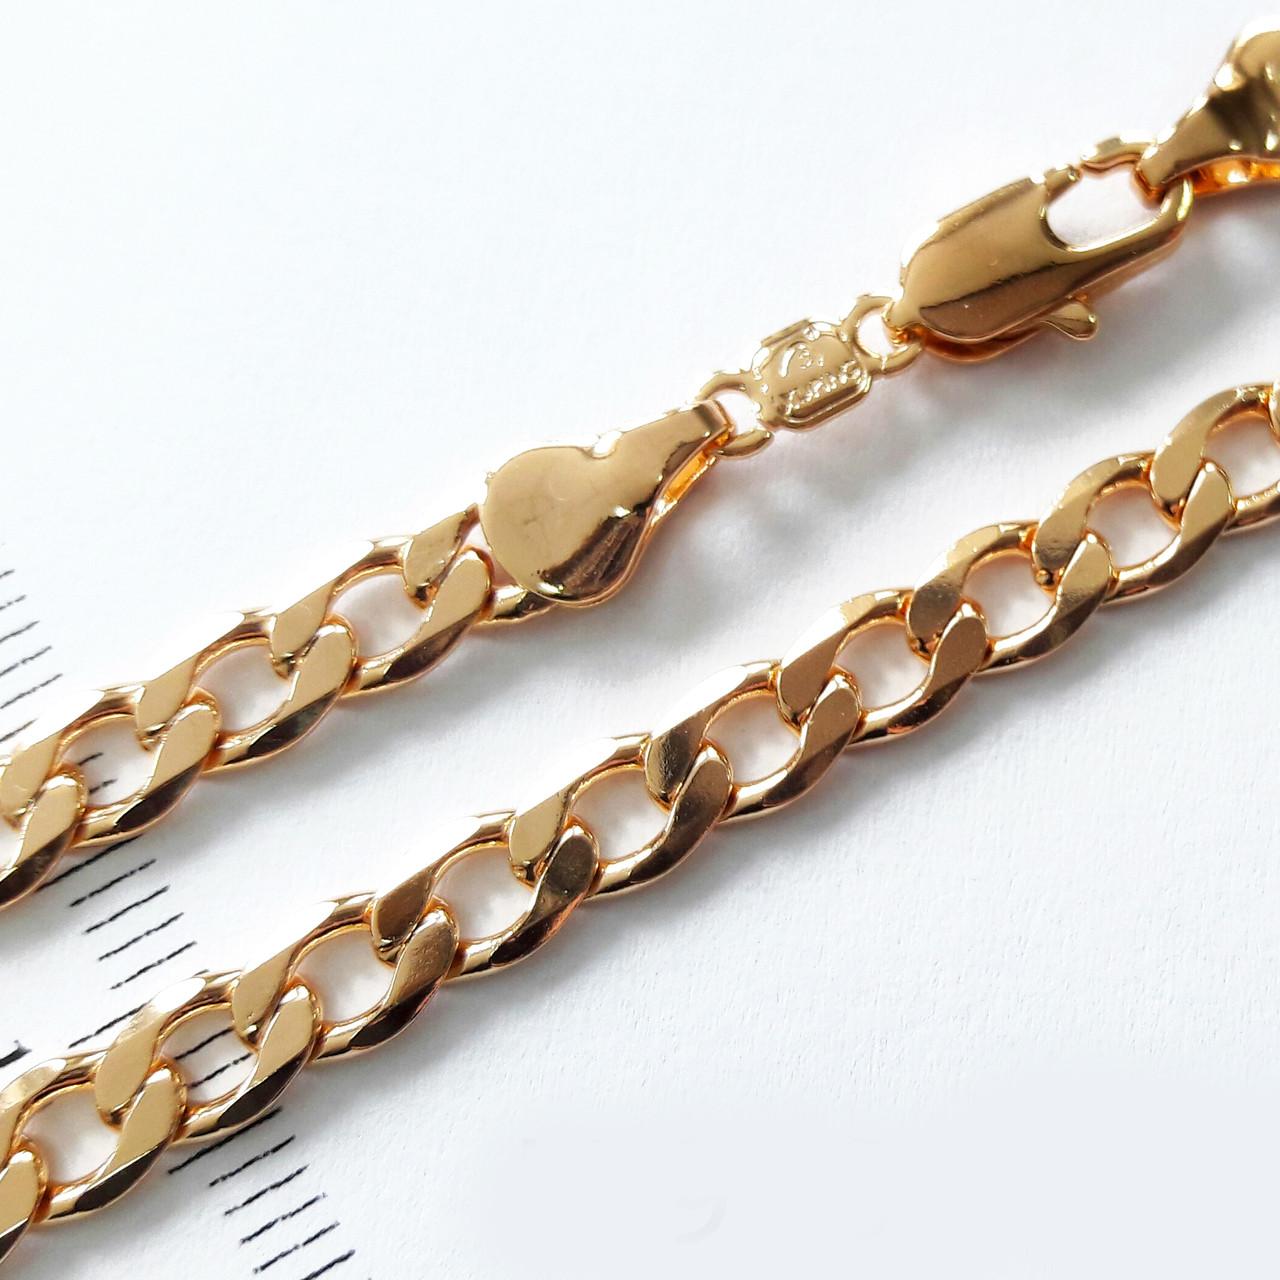 Цепочка xuping 5мм 50см панцирное плетение ц350